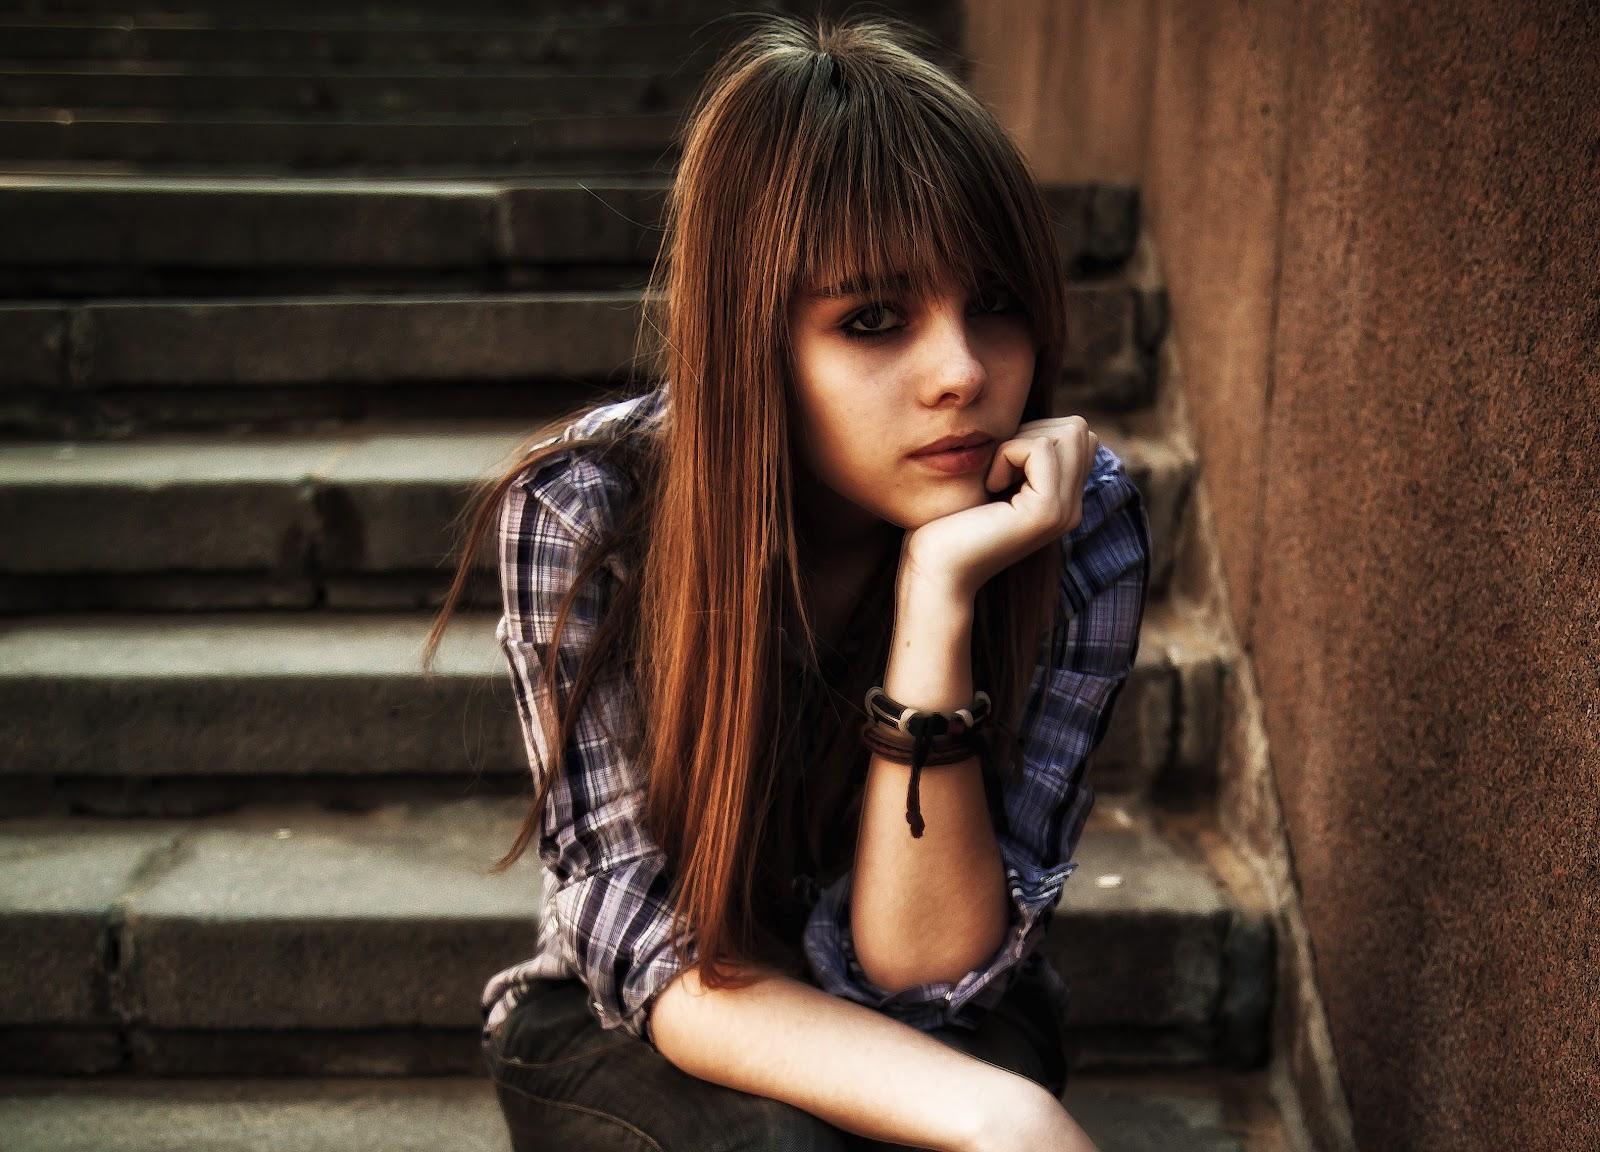 sad girl sad girl sad girl 1600x1152